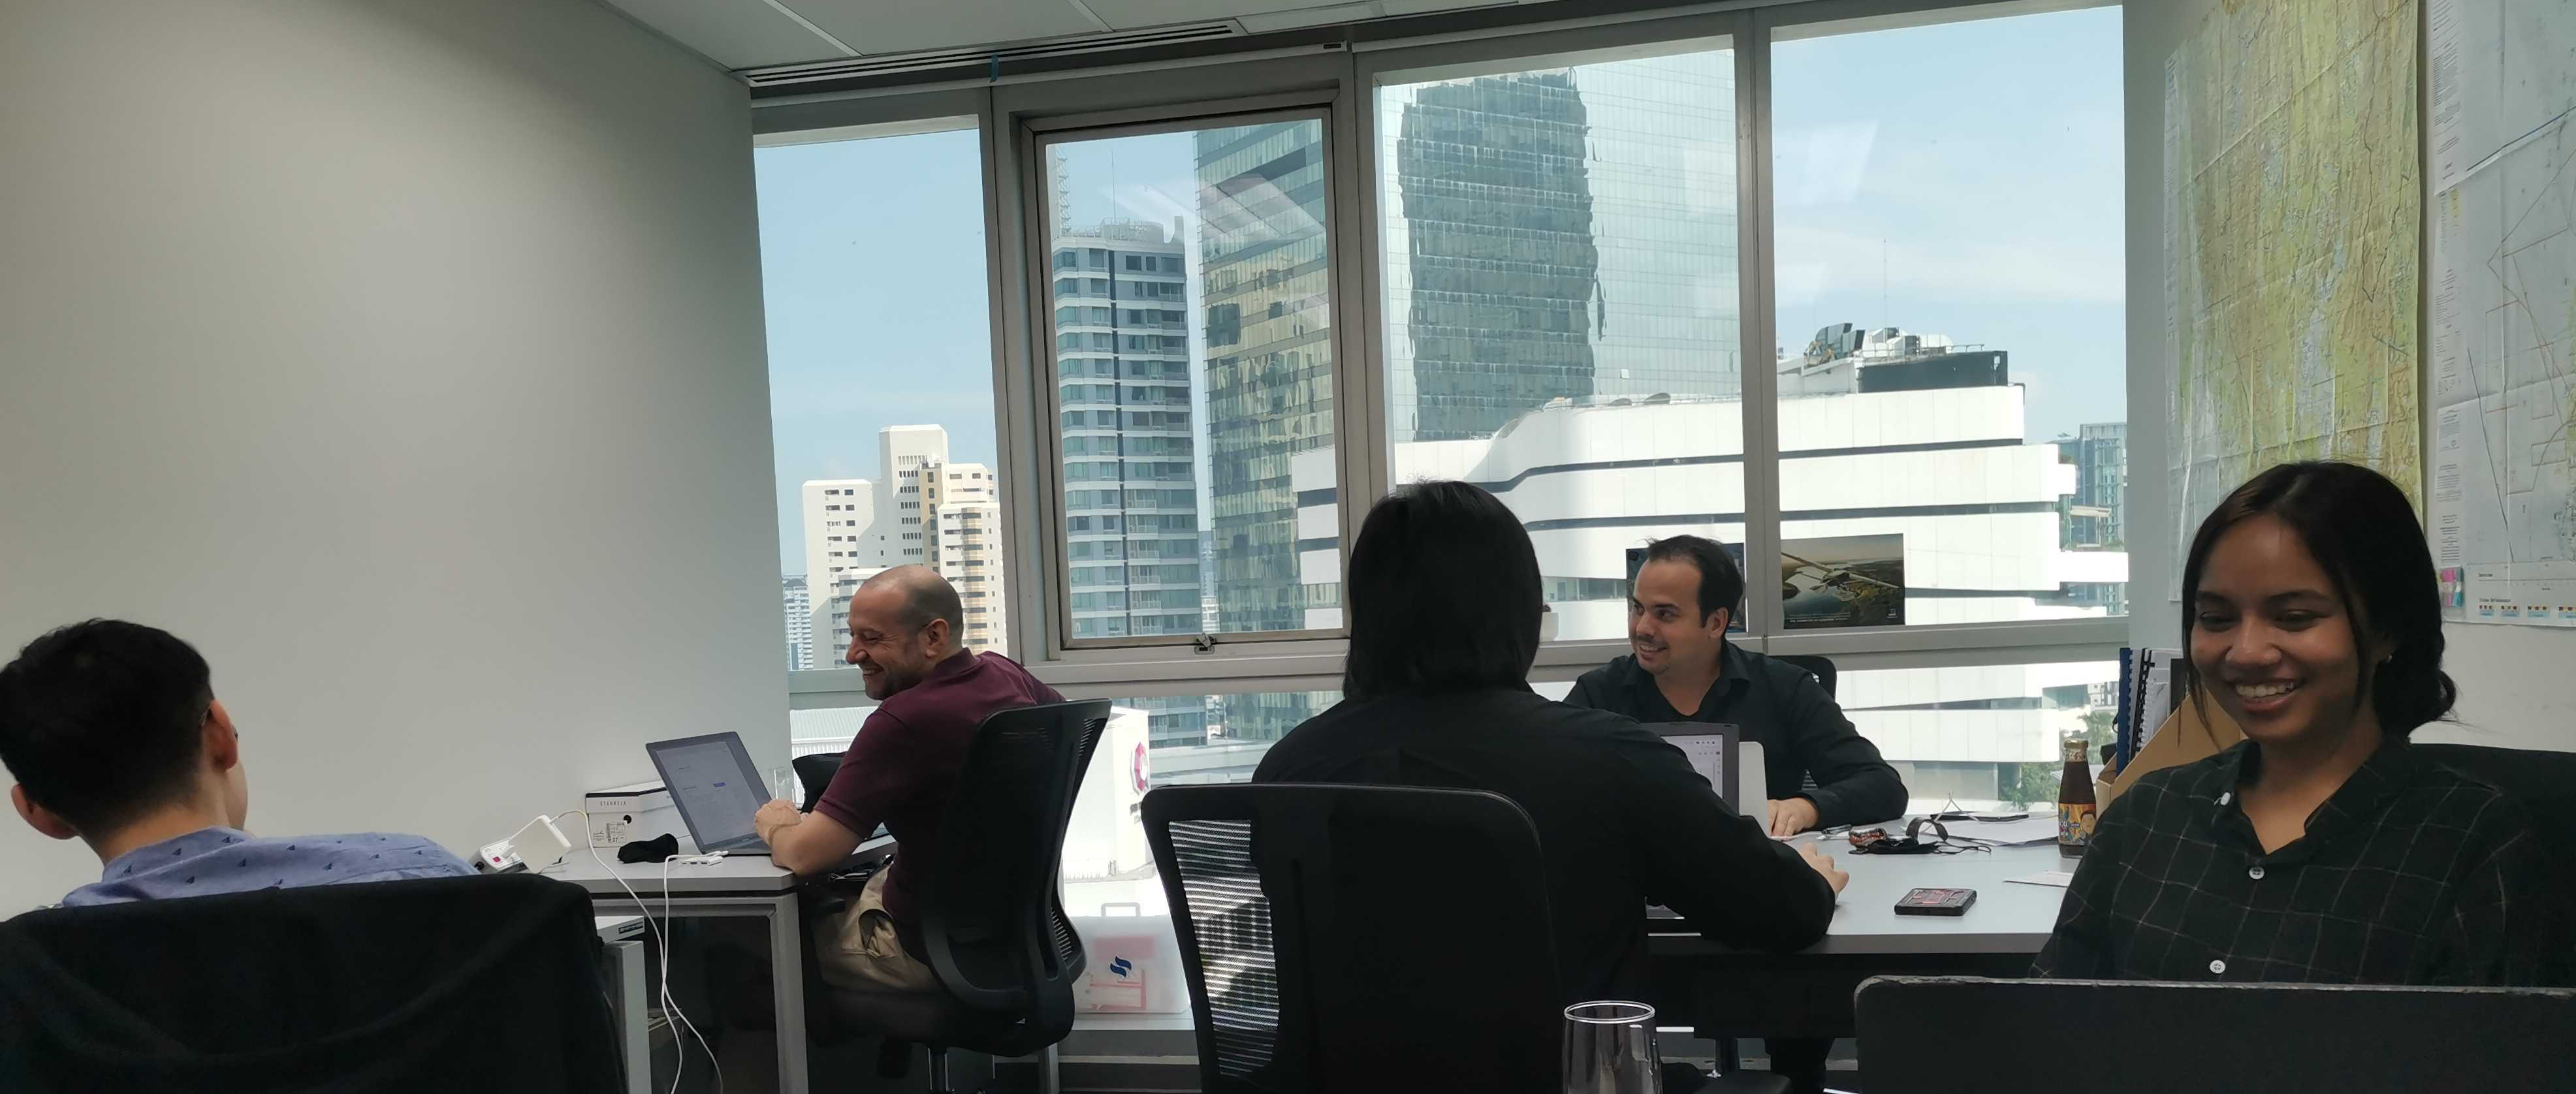 Siam Seaplane Office Bangkok HQ